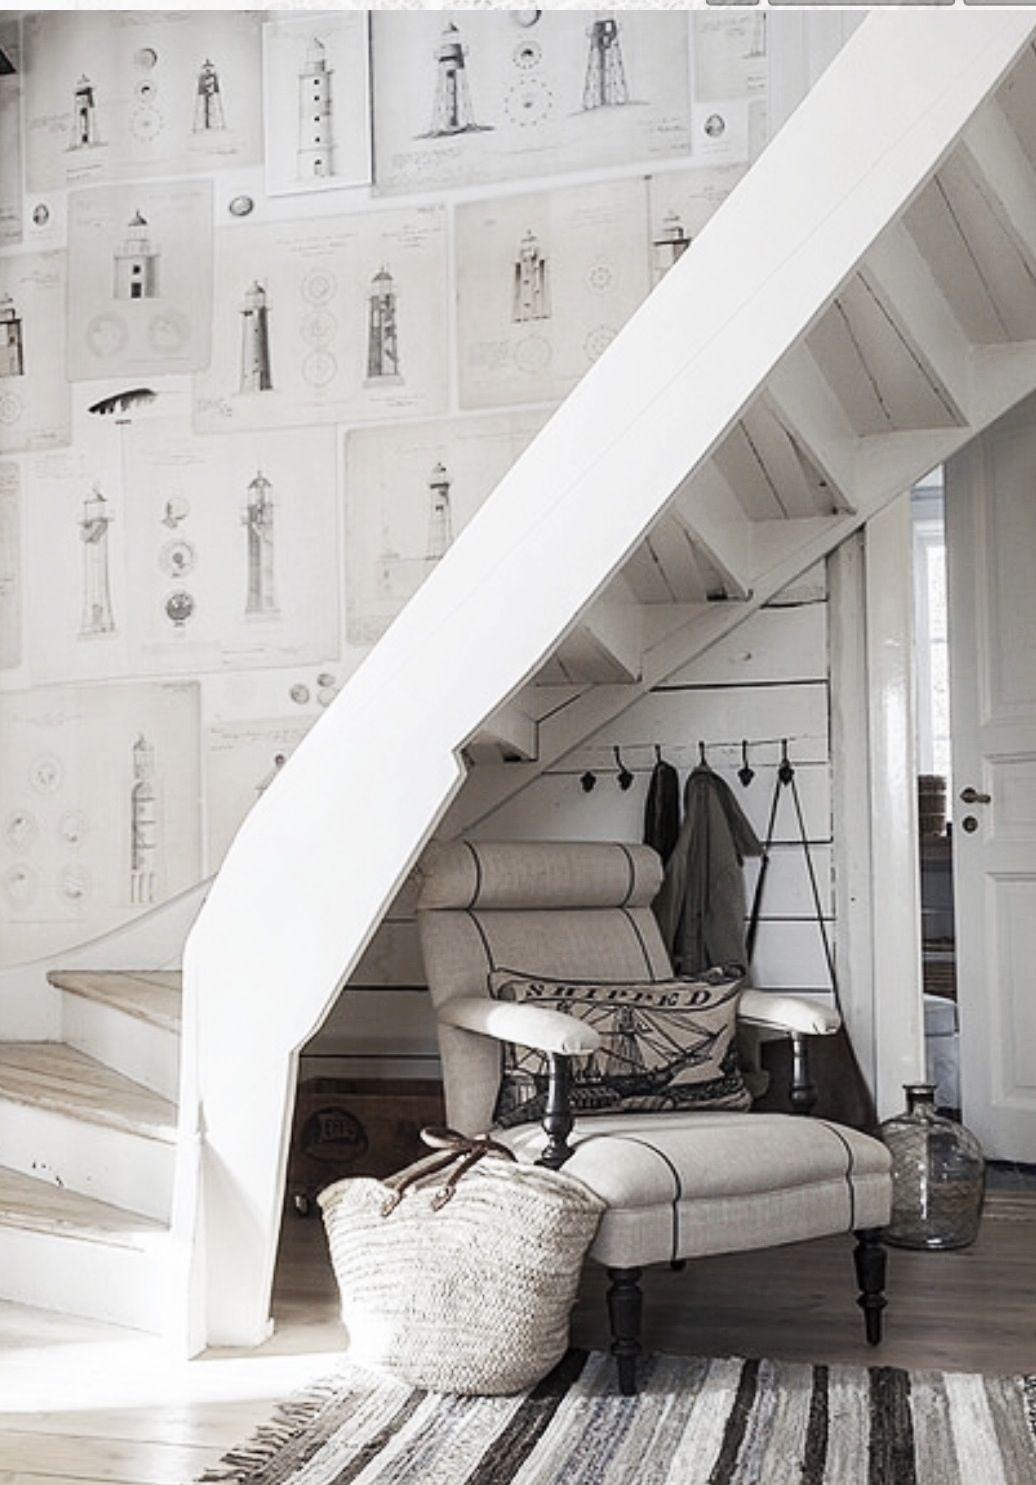 Wohnideen Treppenaufgang pin maude b pomerleau auf home wohnideen flur